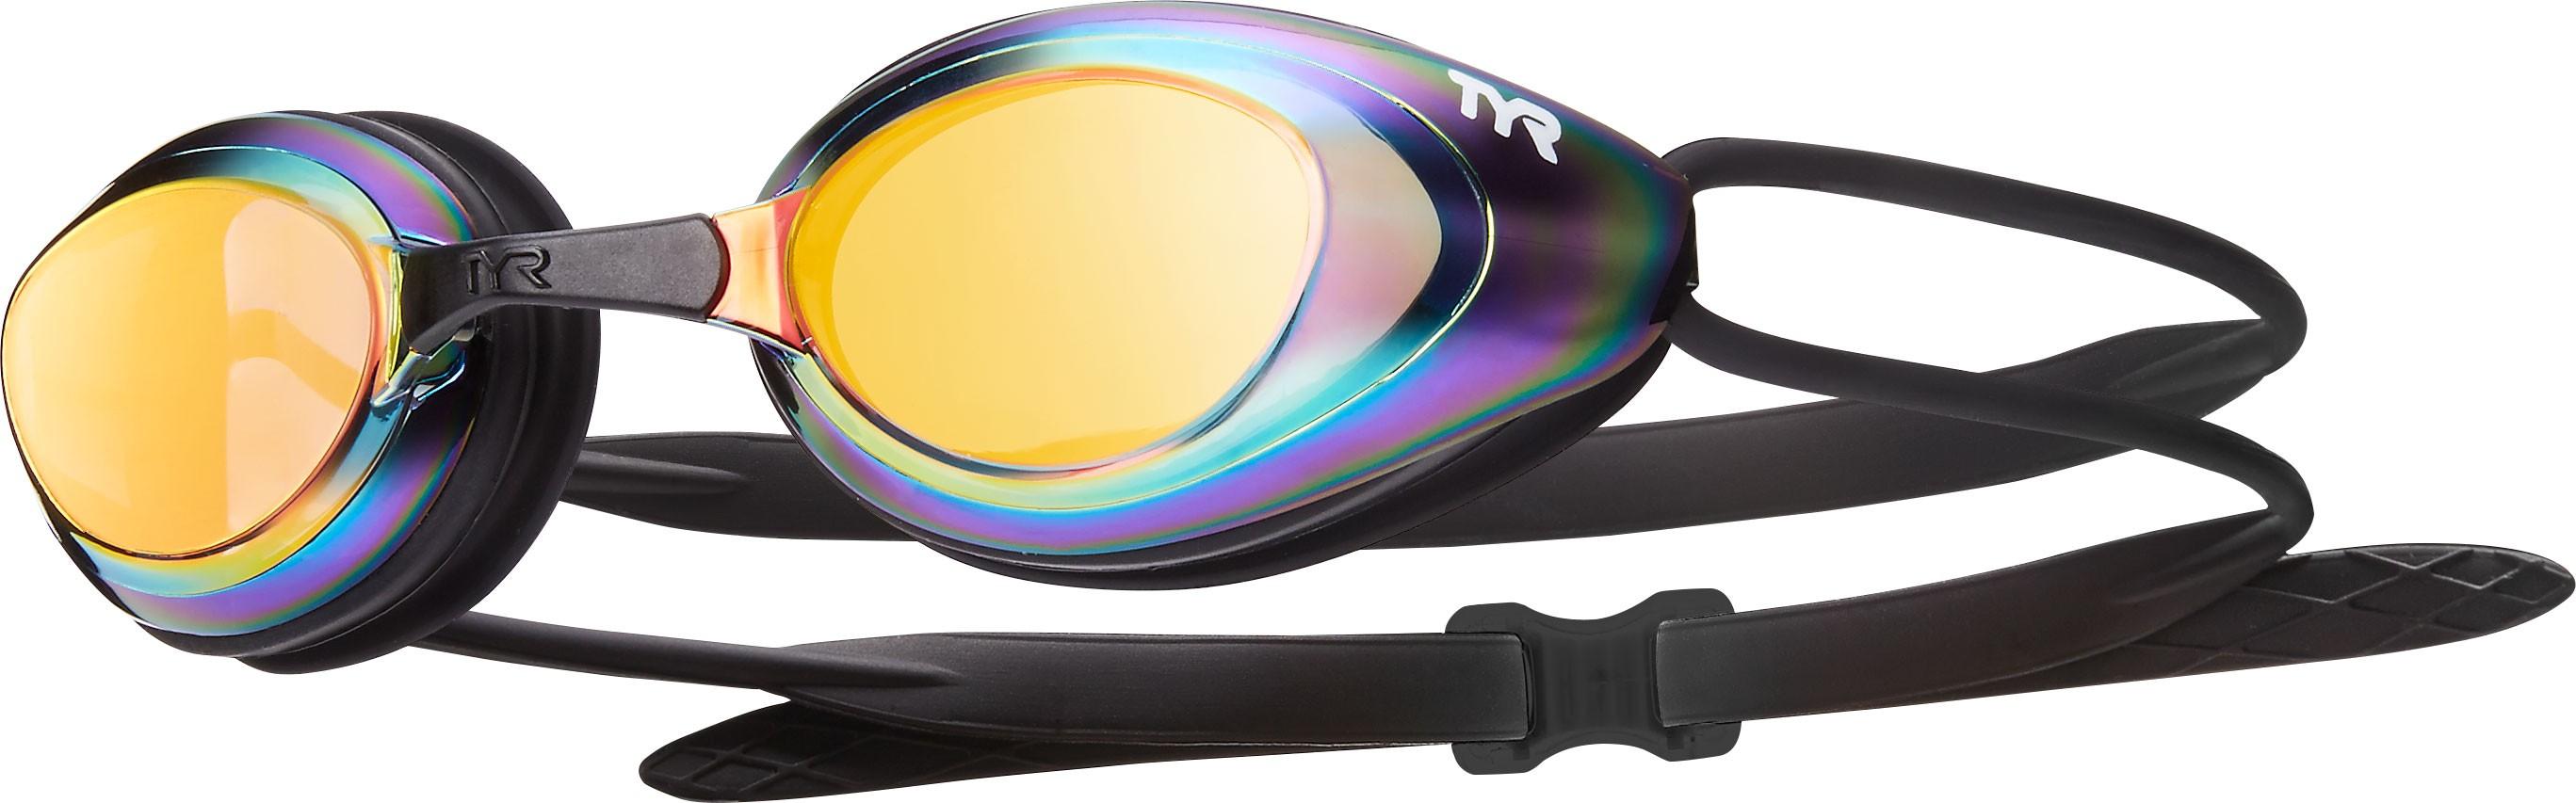 9c63c62ee7f TYR Blackhawk Racing Mirrored Adult Goggles